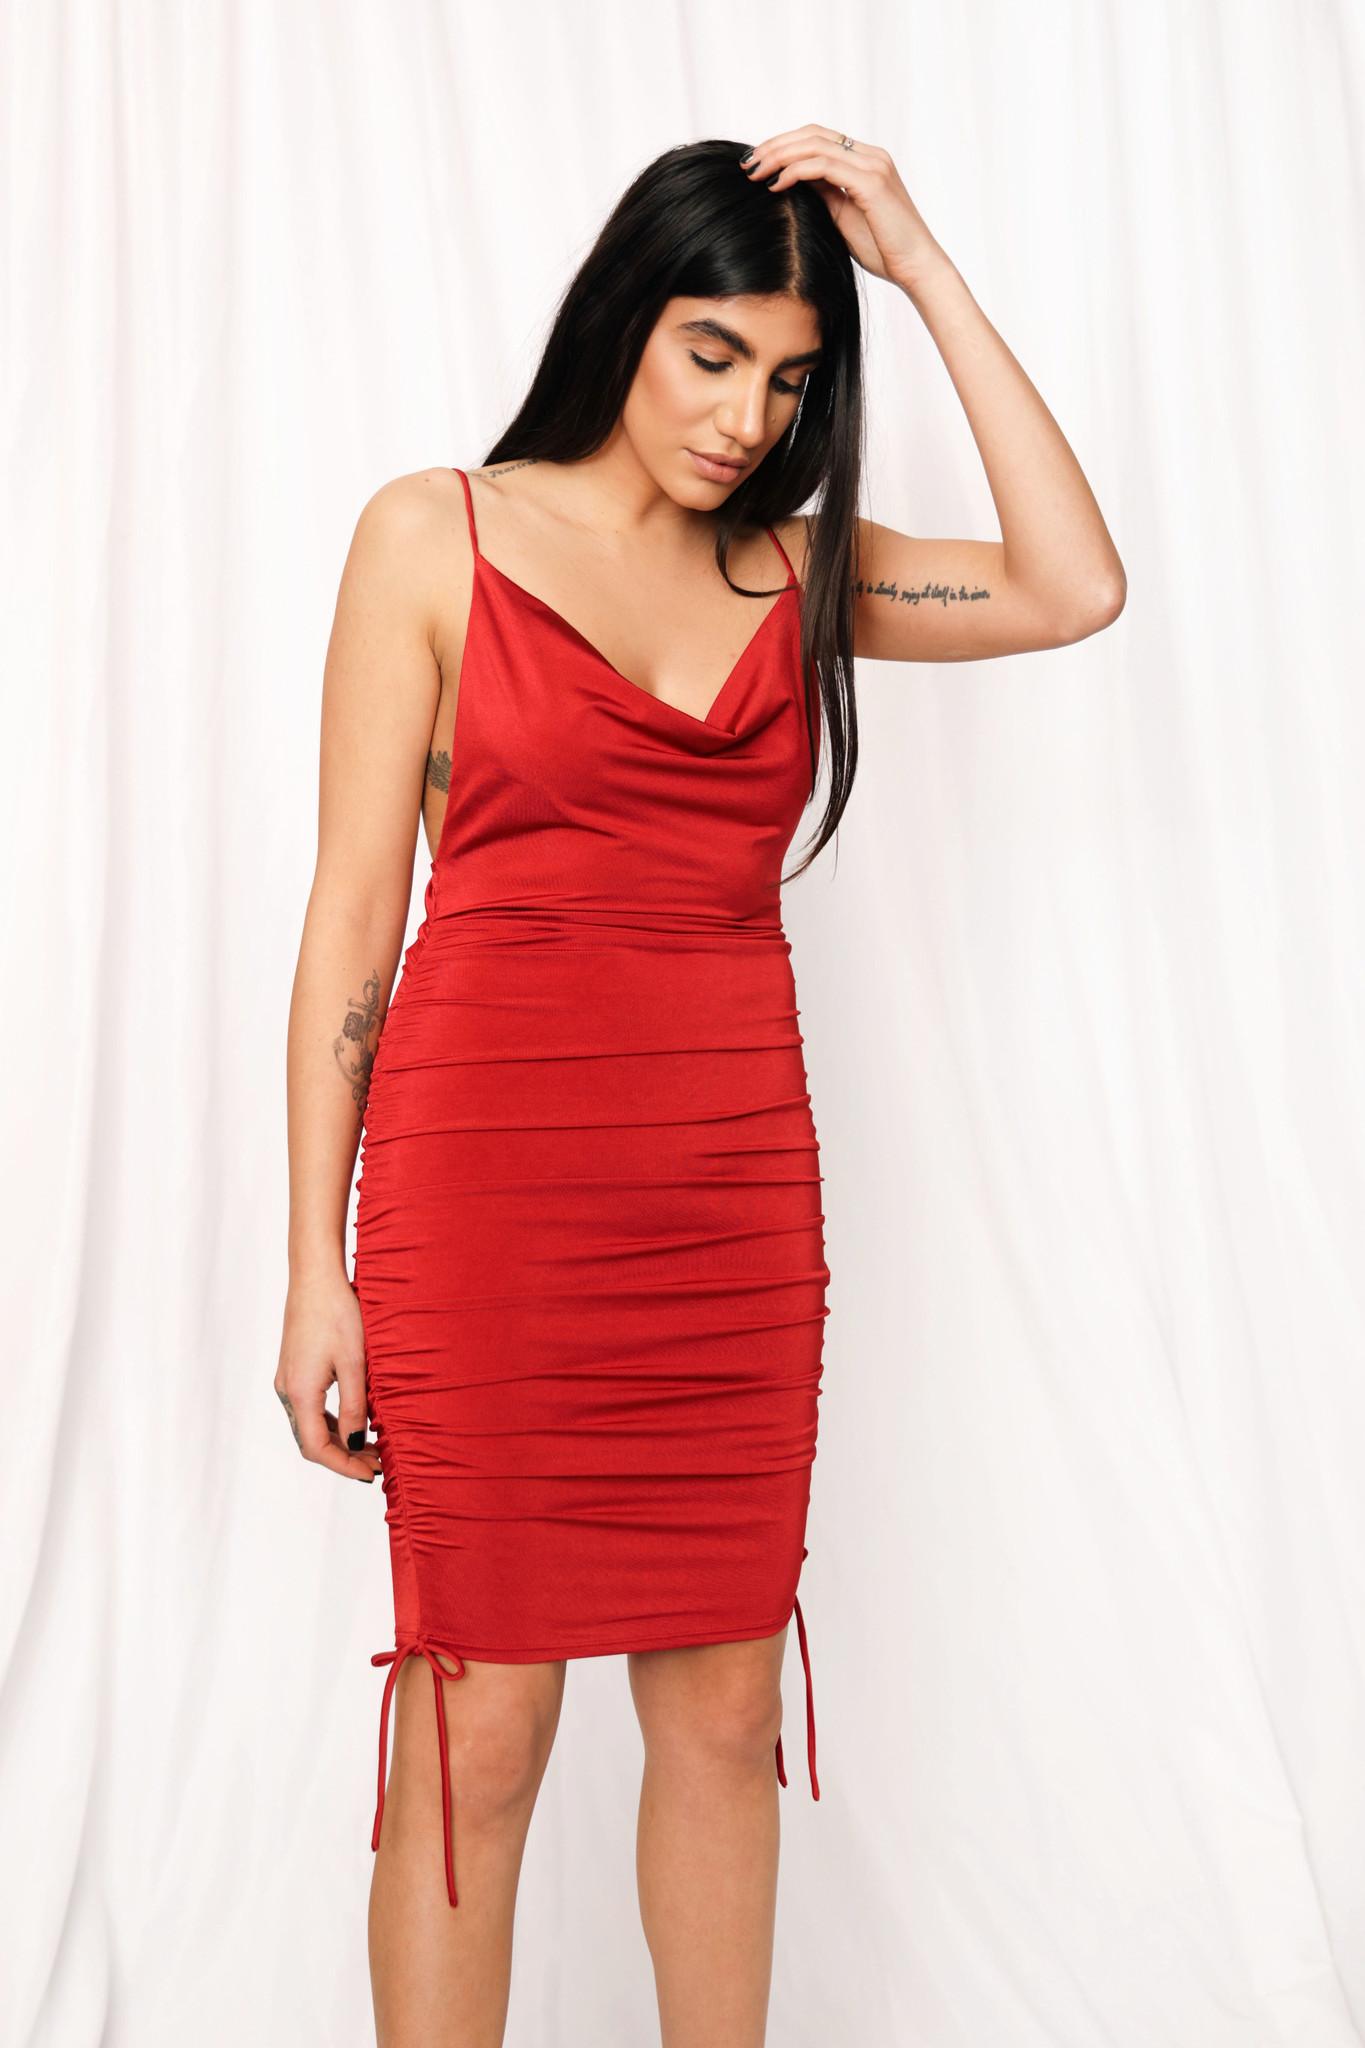 LEXI DREW 0864 Ruched Dress